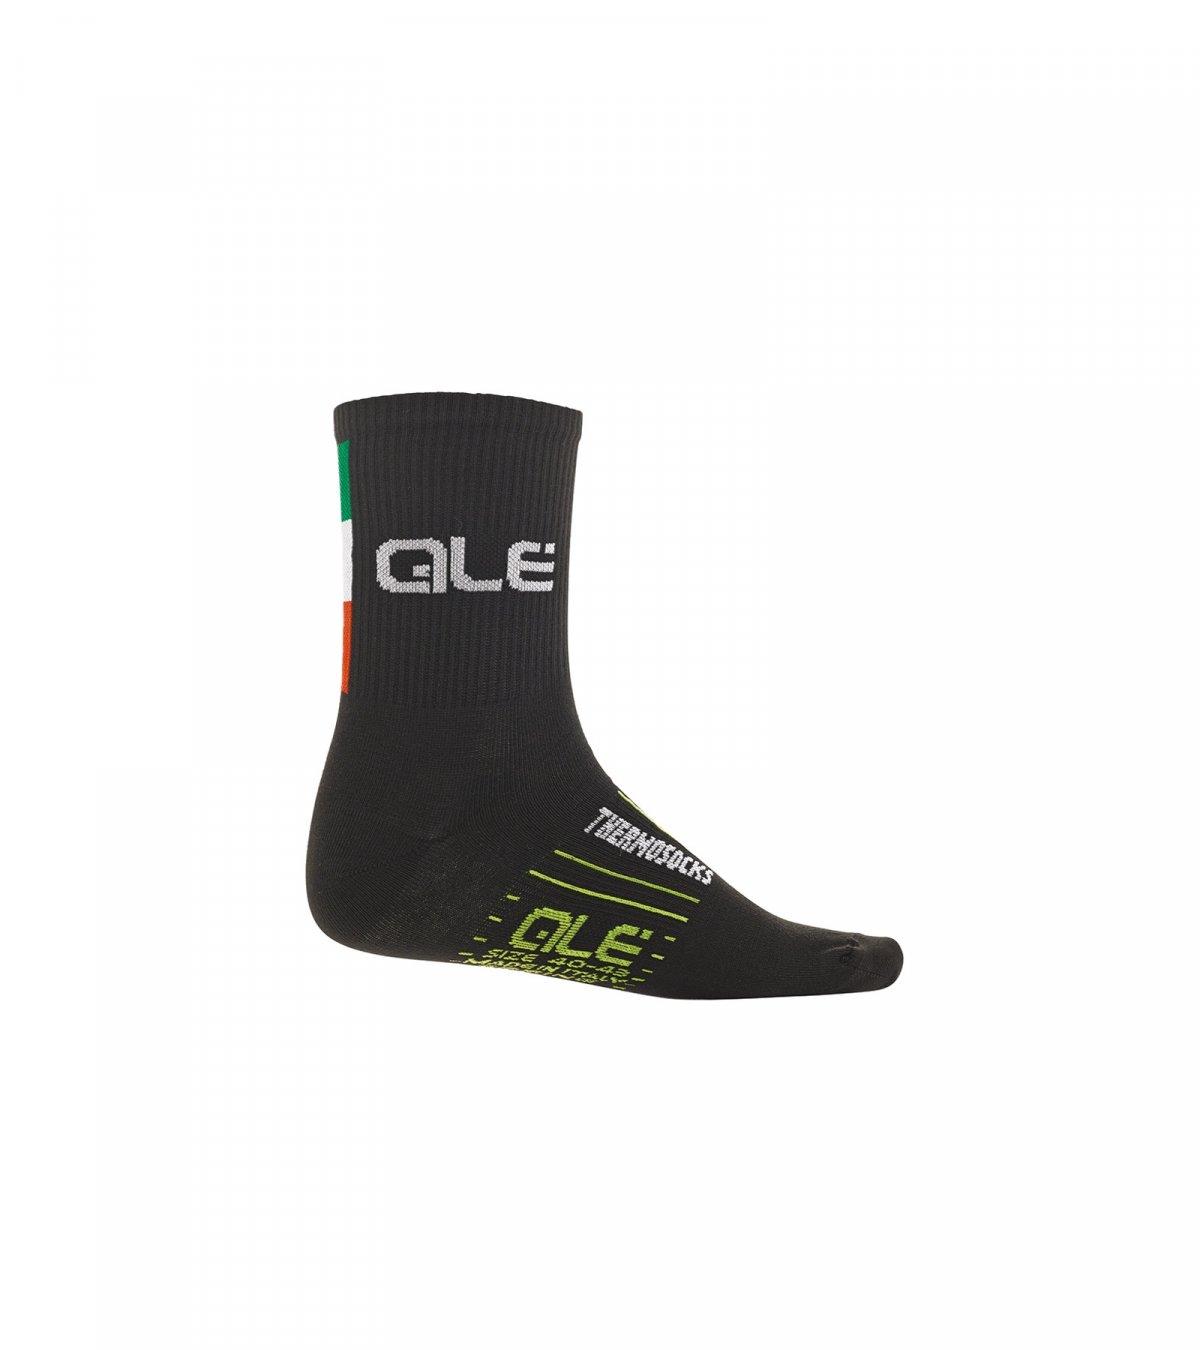 L10440114-spring-thermocool-black-middle-season-socks_1200_1350